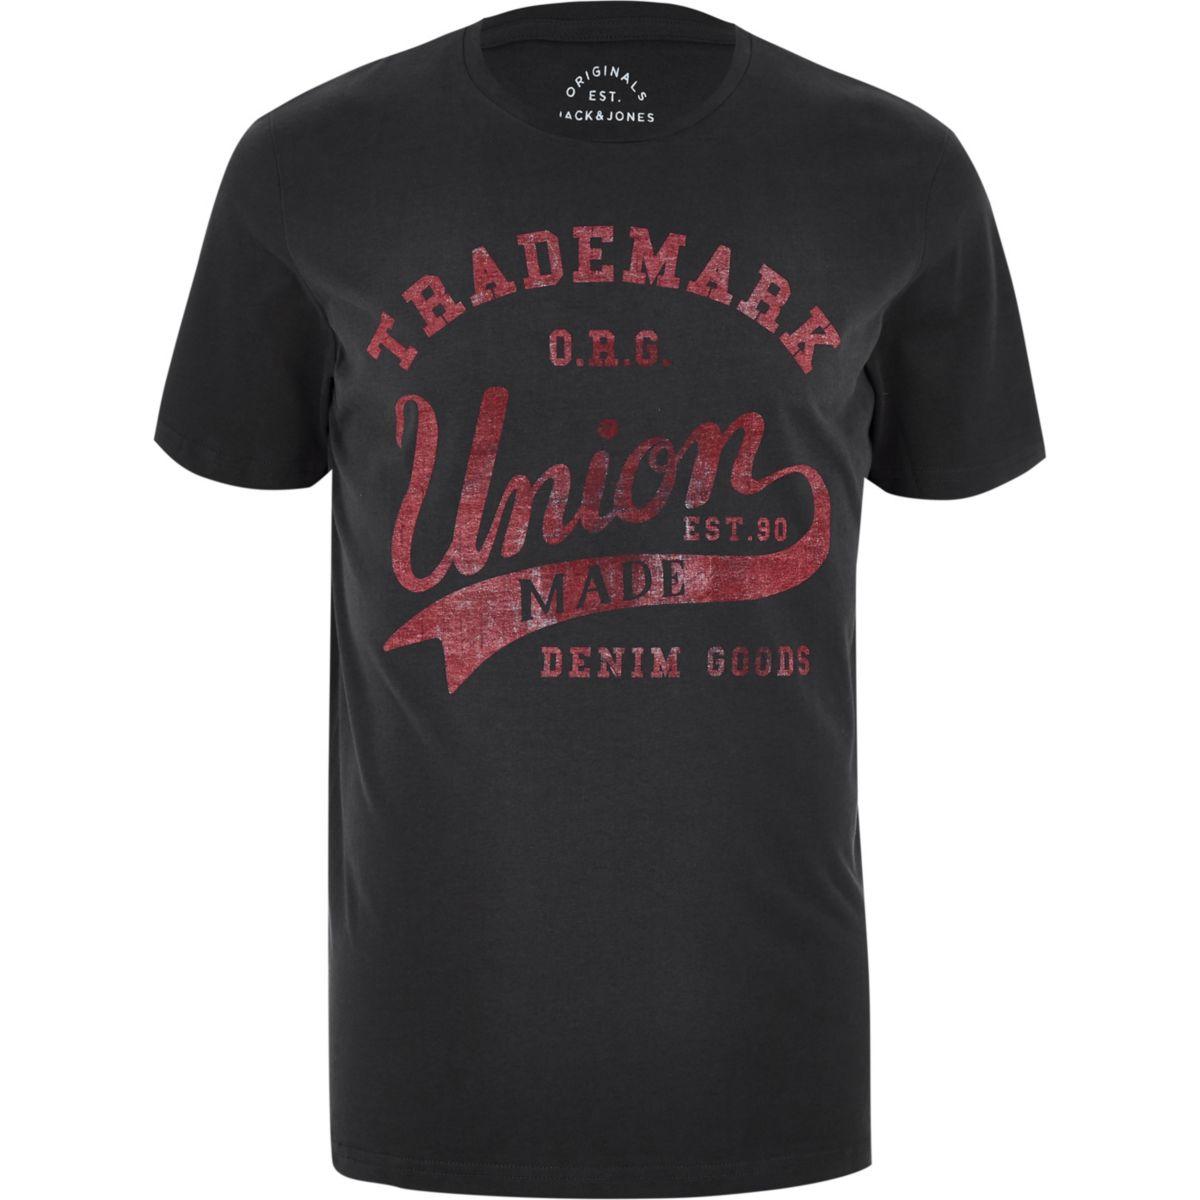 Jack & Jones dark grey 'union' T-shirt